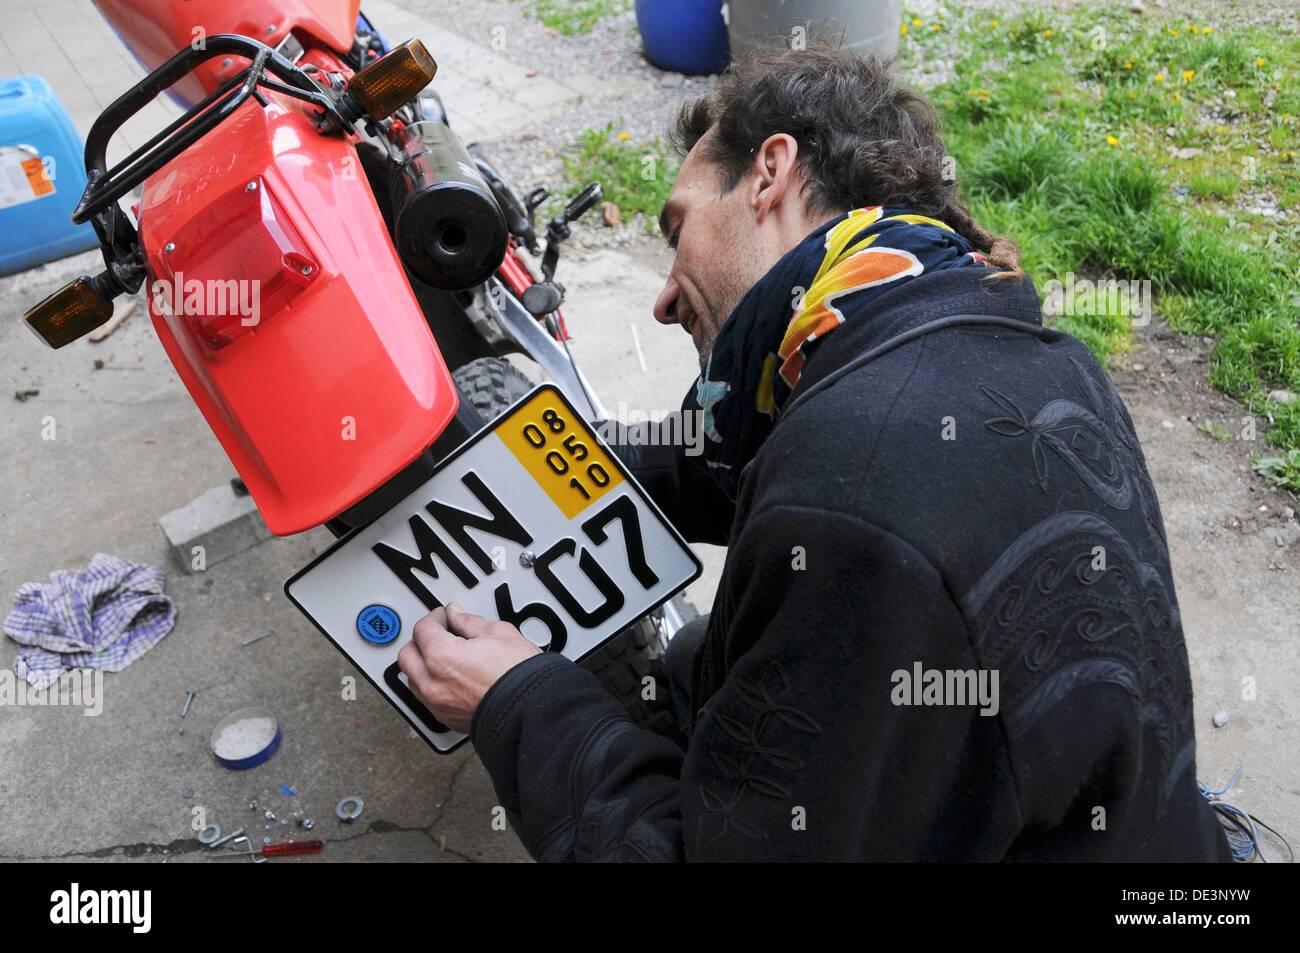 Man season indicator mounted on motorcycle - Stock Image